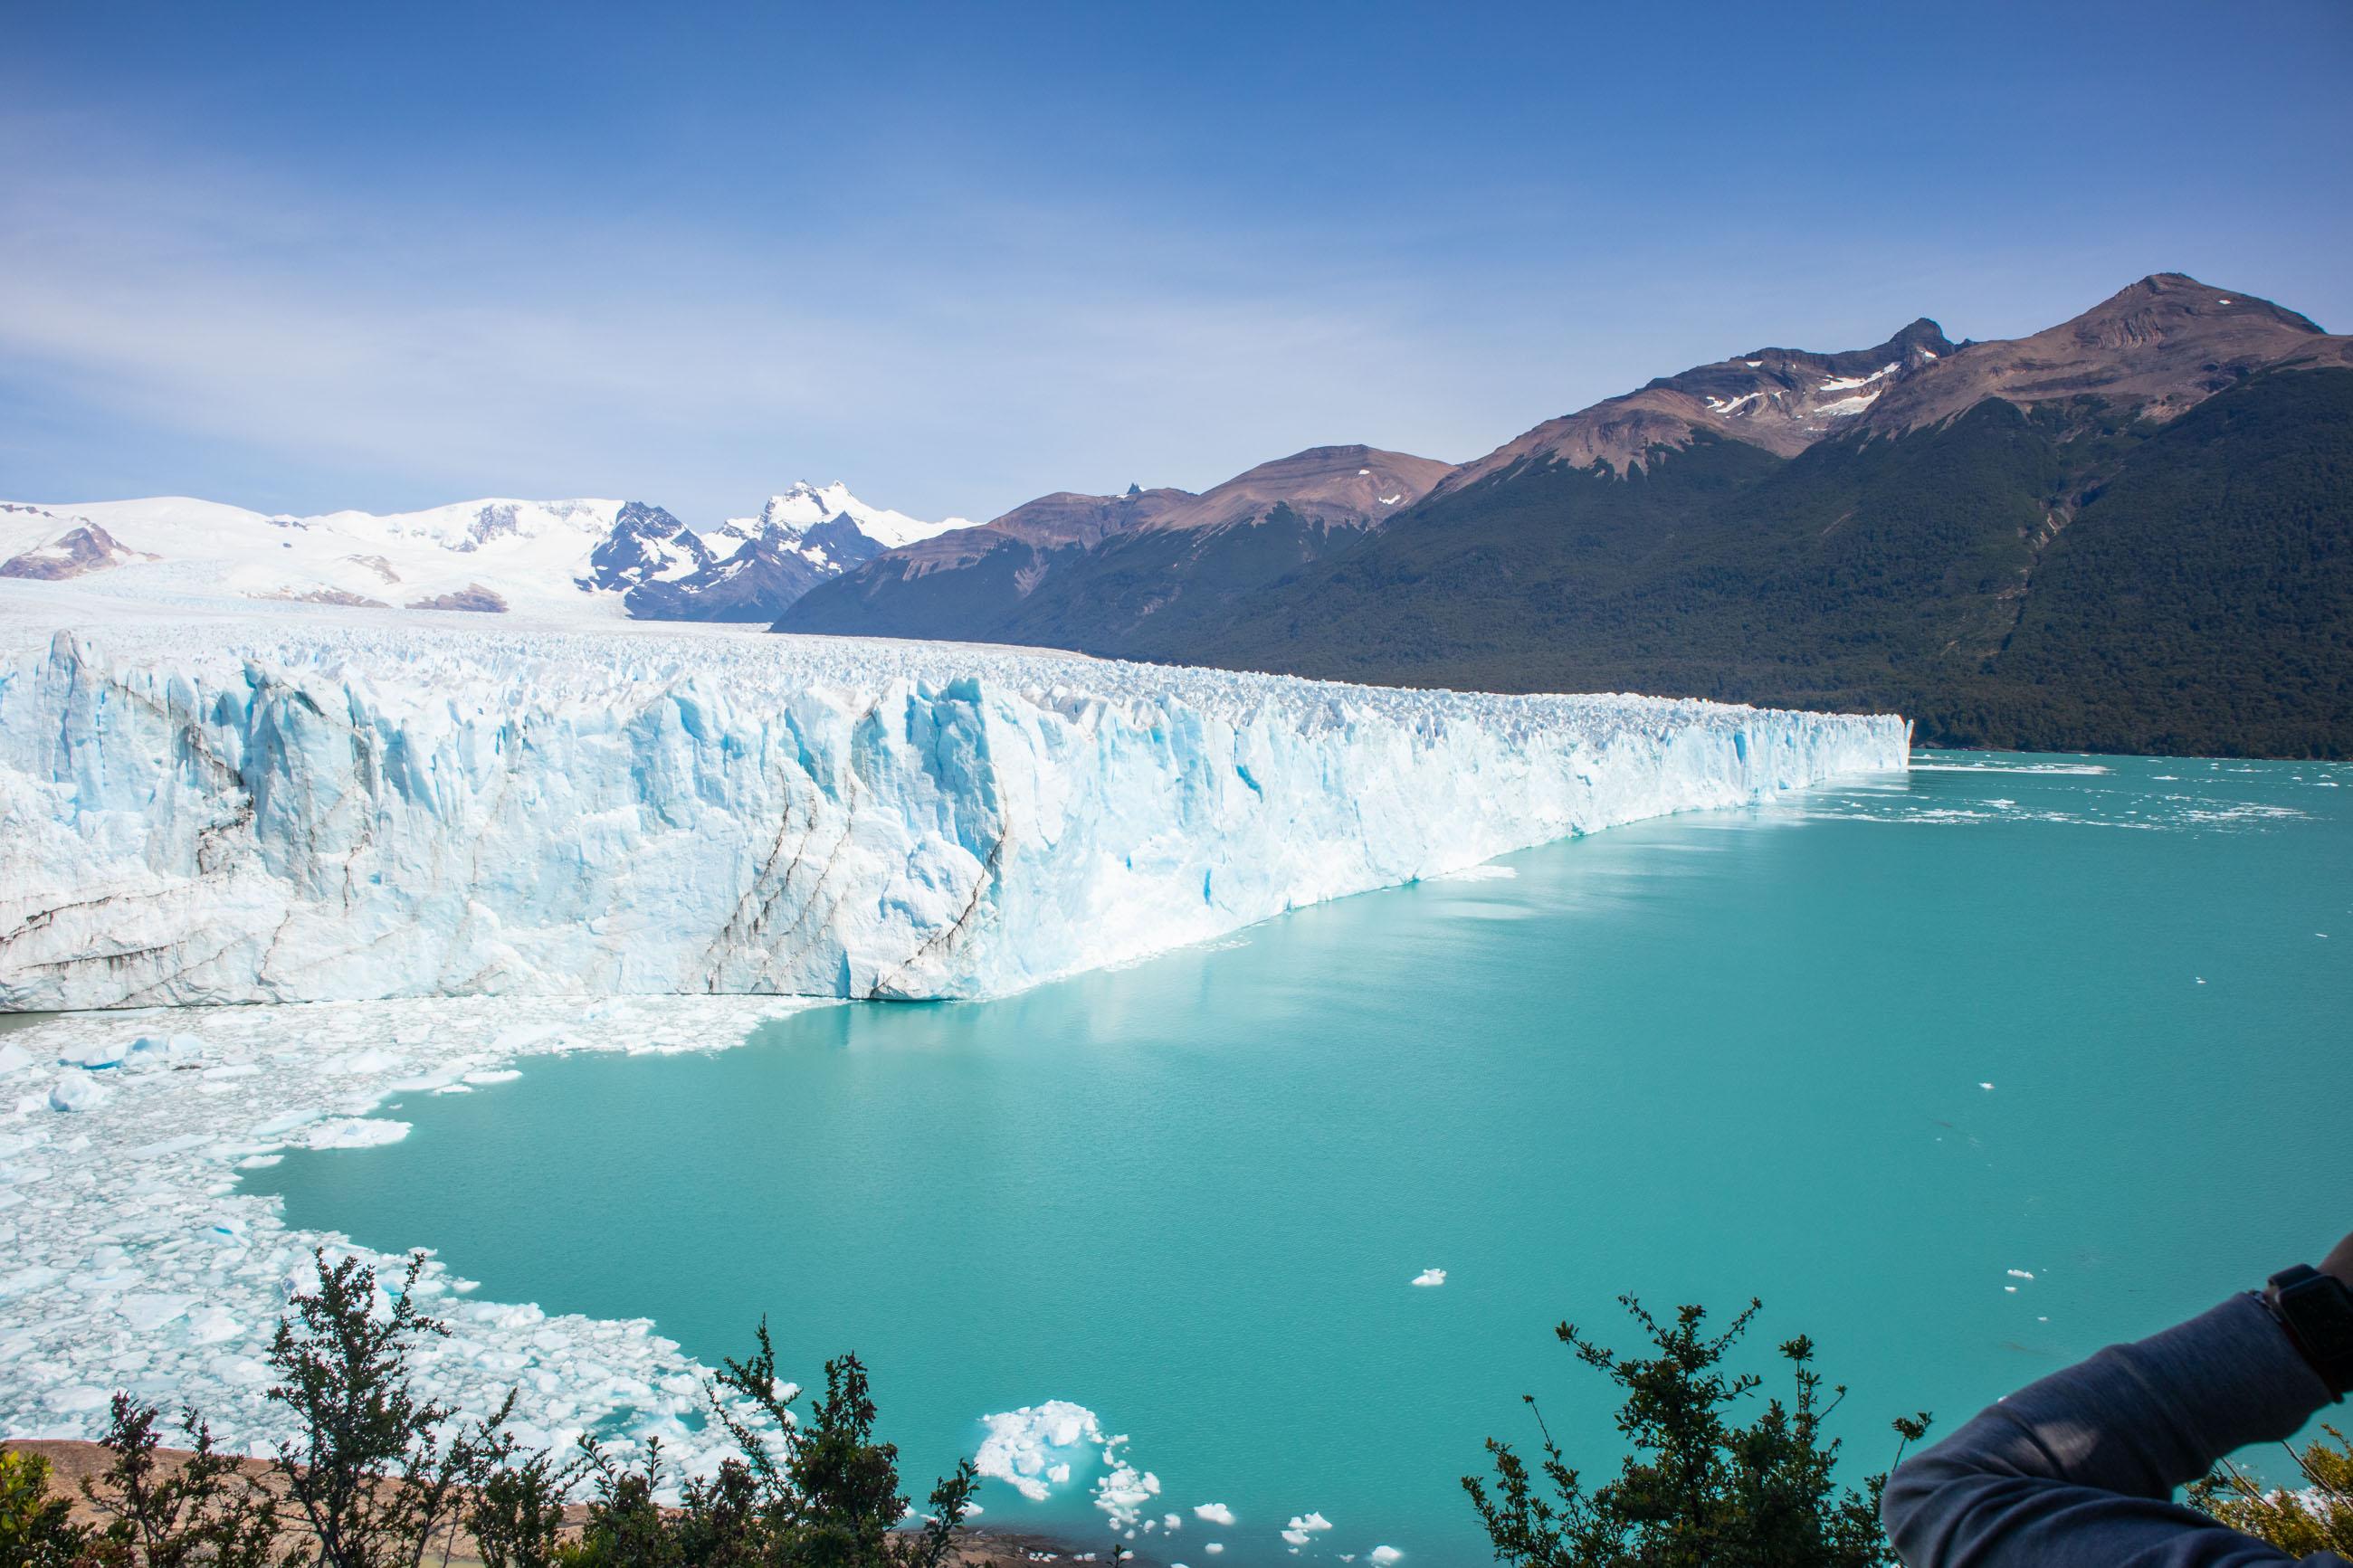 https://bubo.sk/uploads/galleries/5017/danielasnovakova_patagonia_argentina_img_3855.jpg